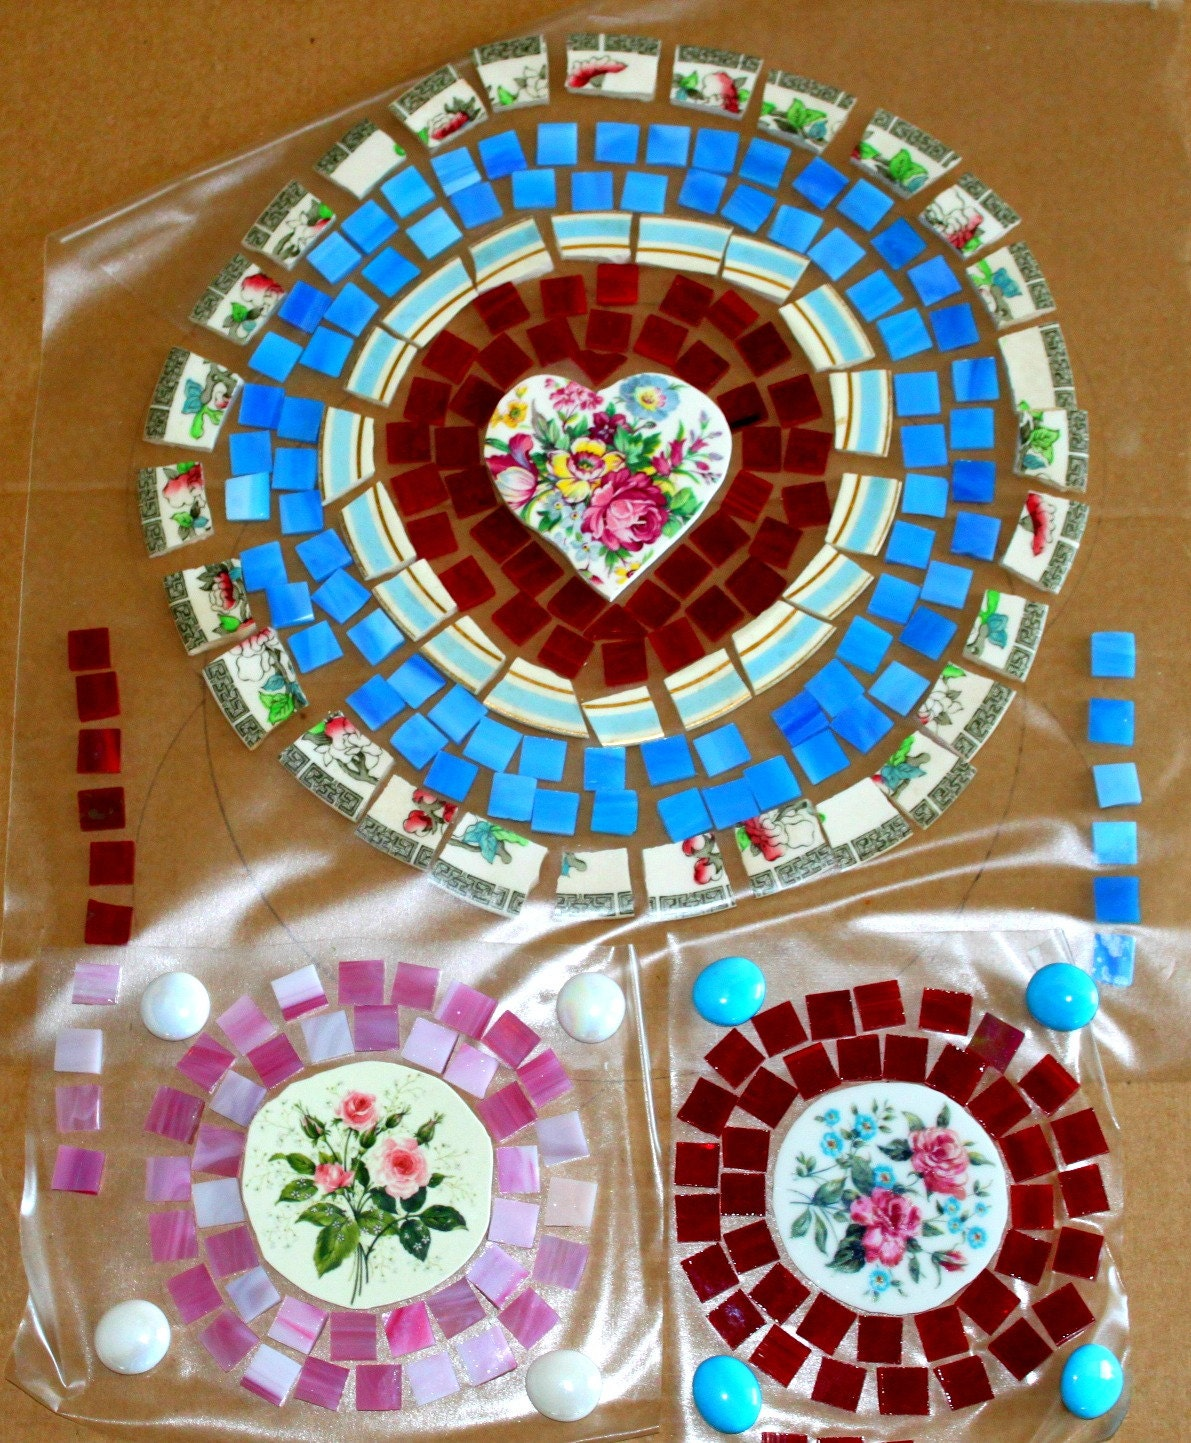 Broken Tile Coffee Table: Mosaic Tile Focals Broken Plates Table Top Set Romantic